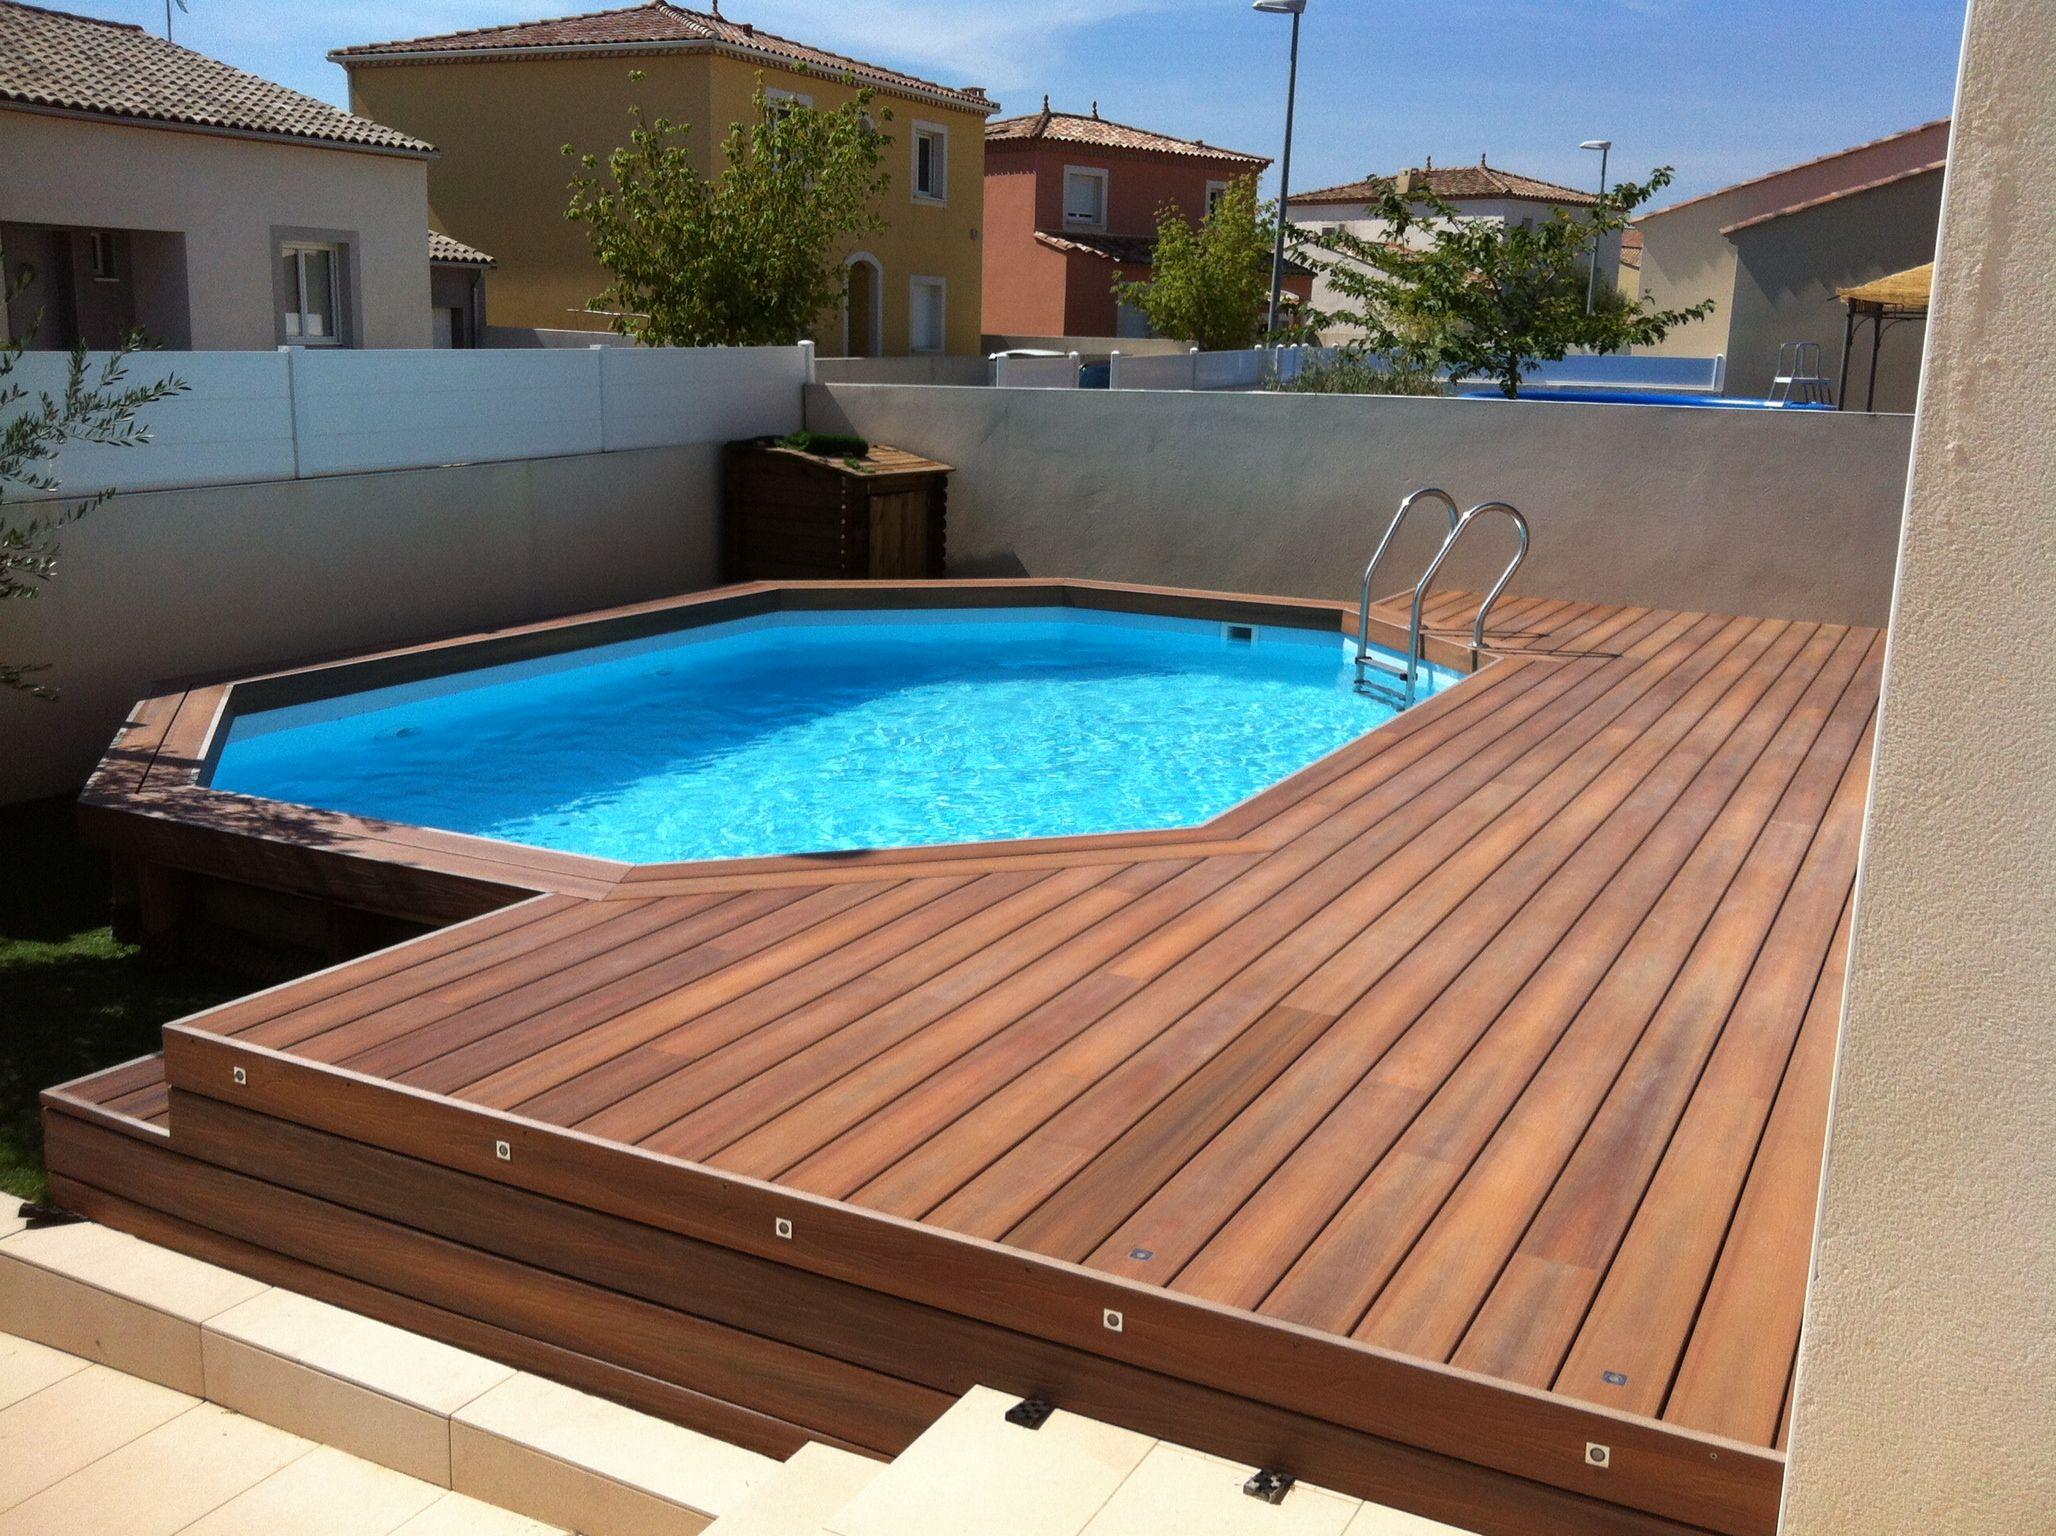 Aménagement de terrasse de piscine hors sol en posite